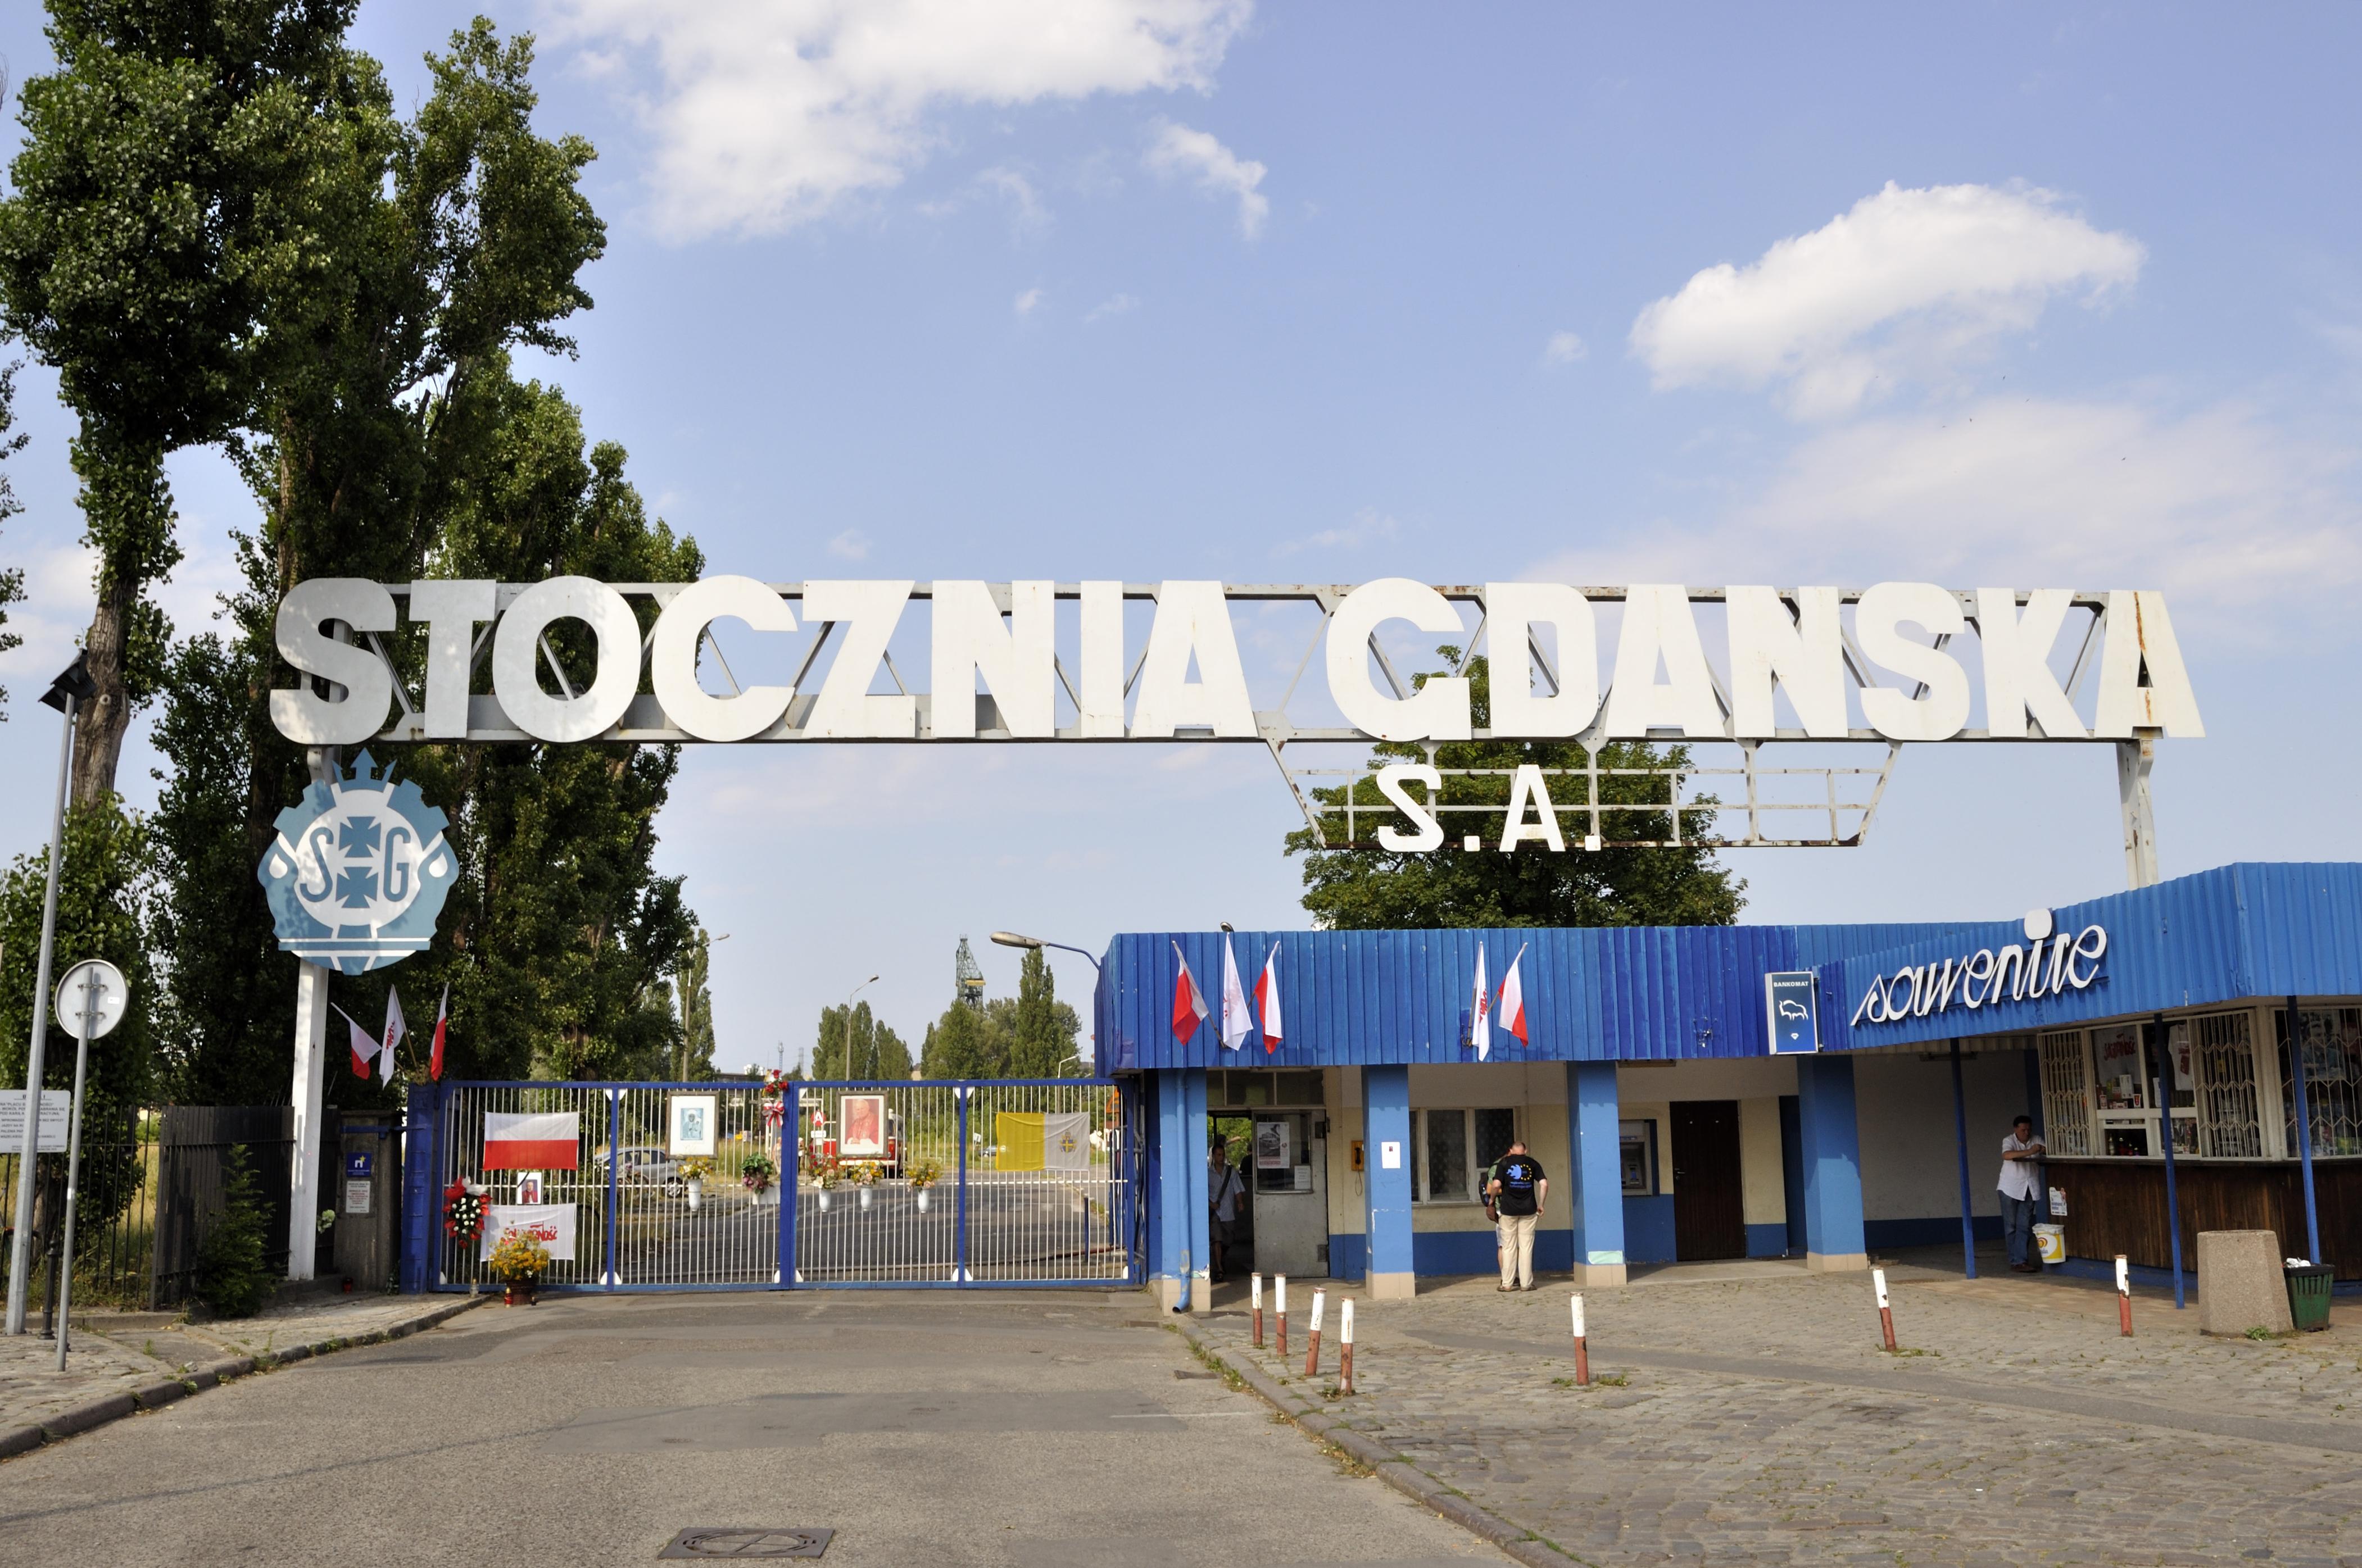 Stocznia_Gdańska_S.A,_historic_gate